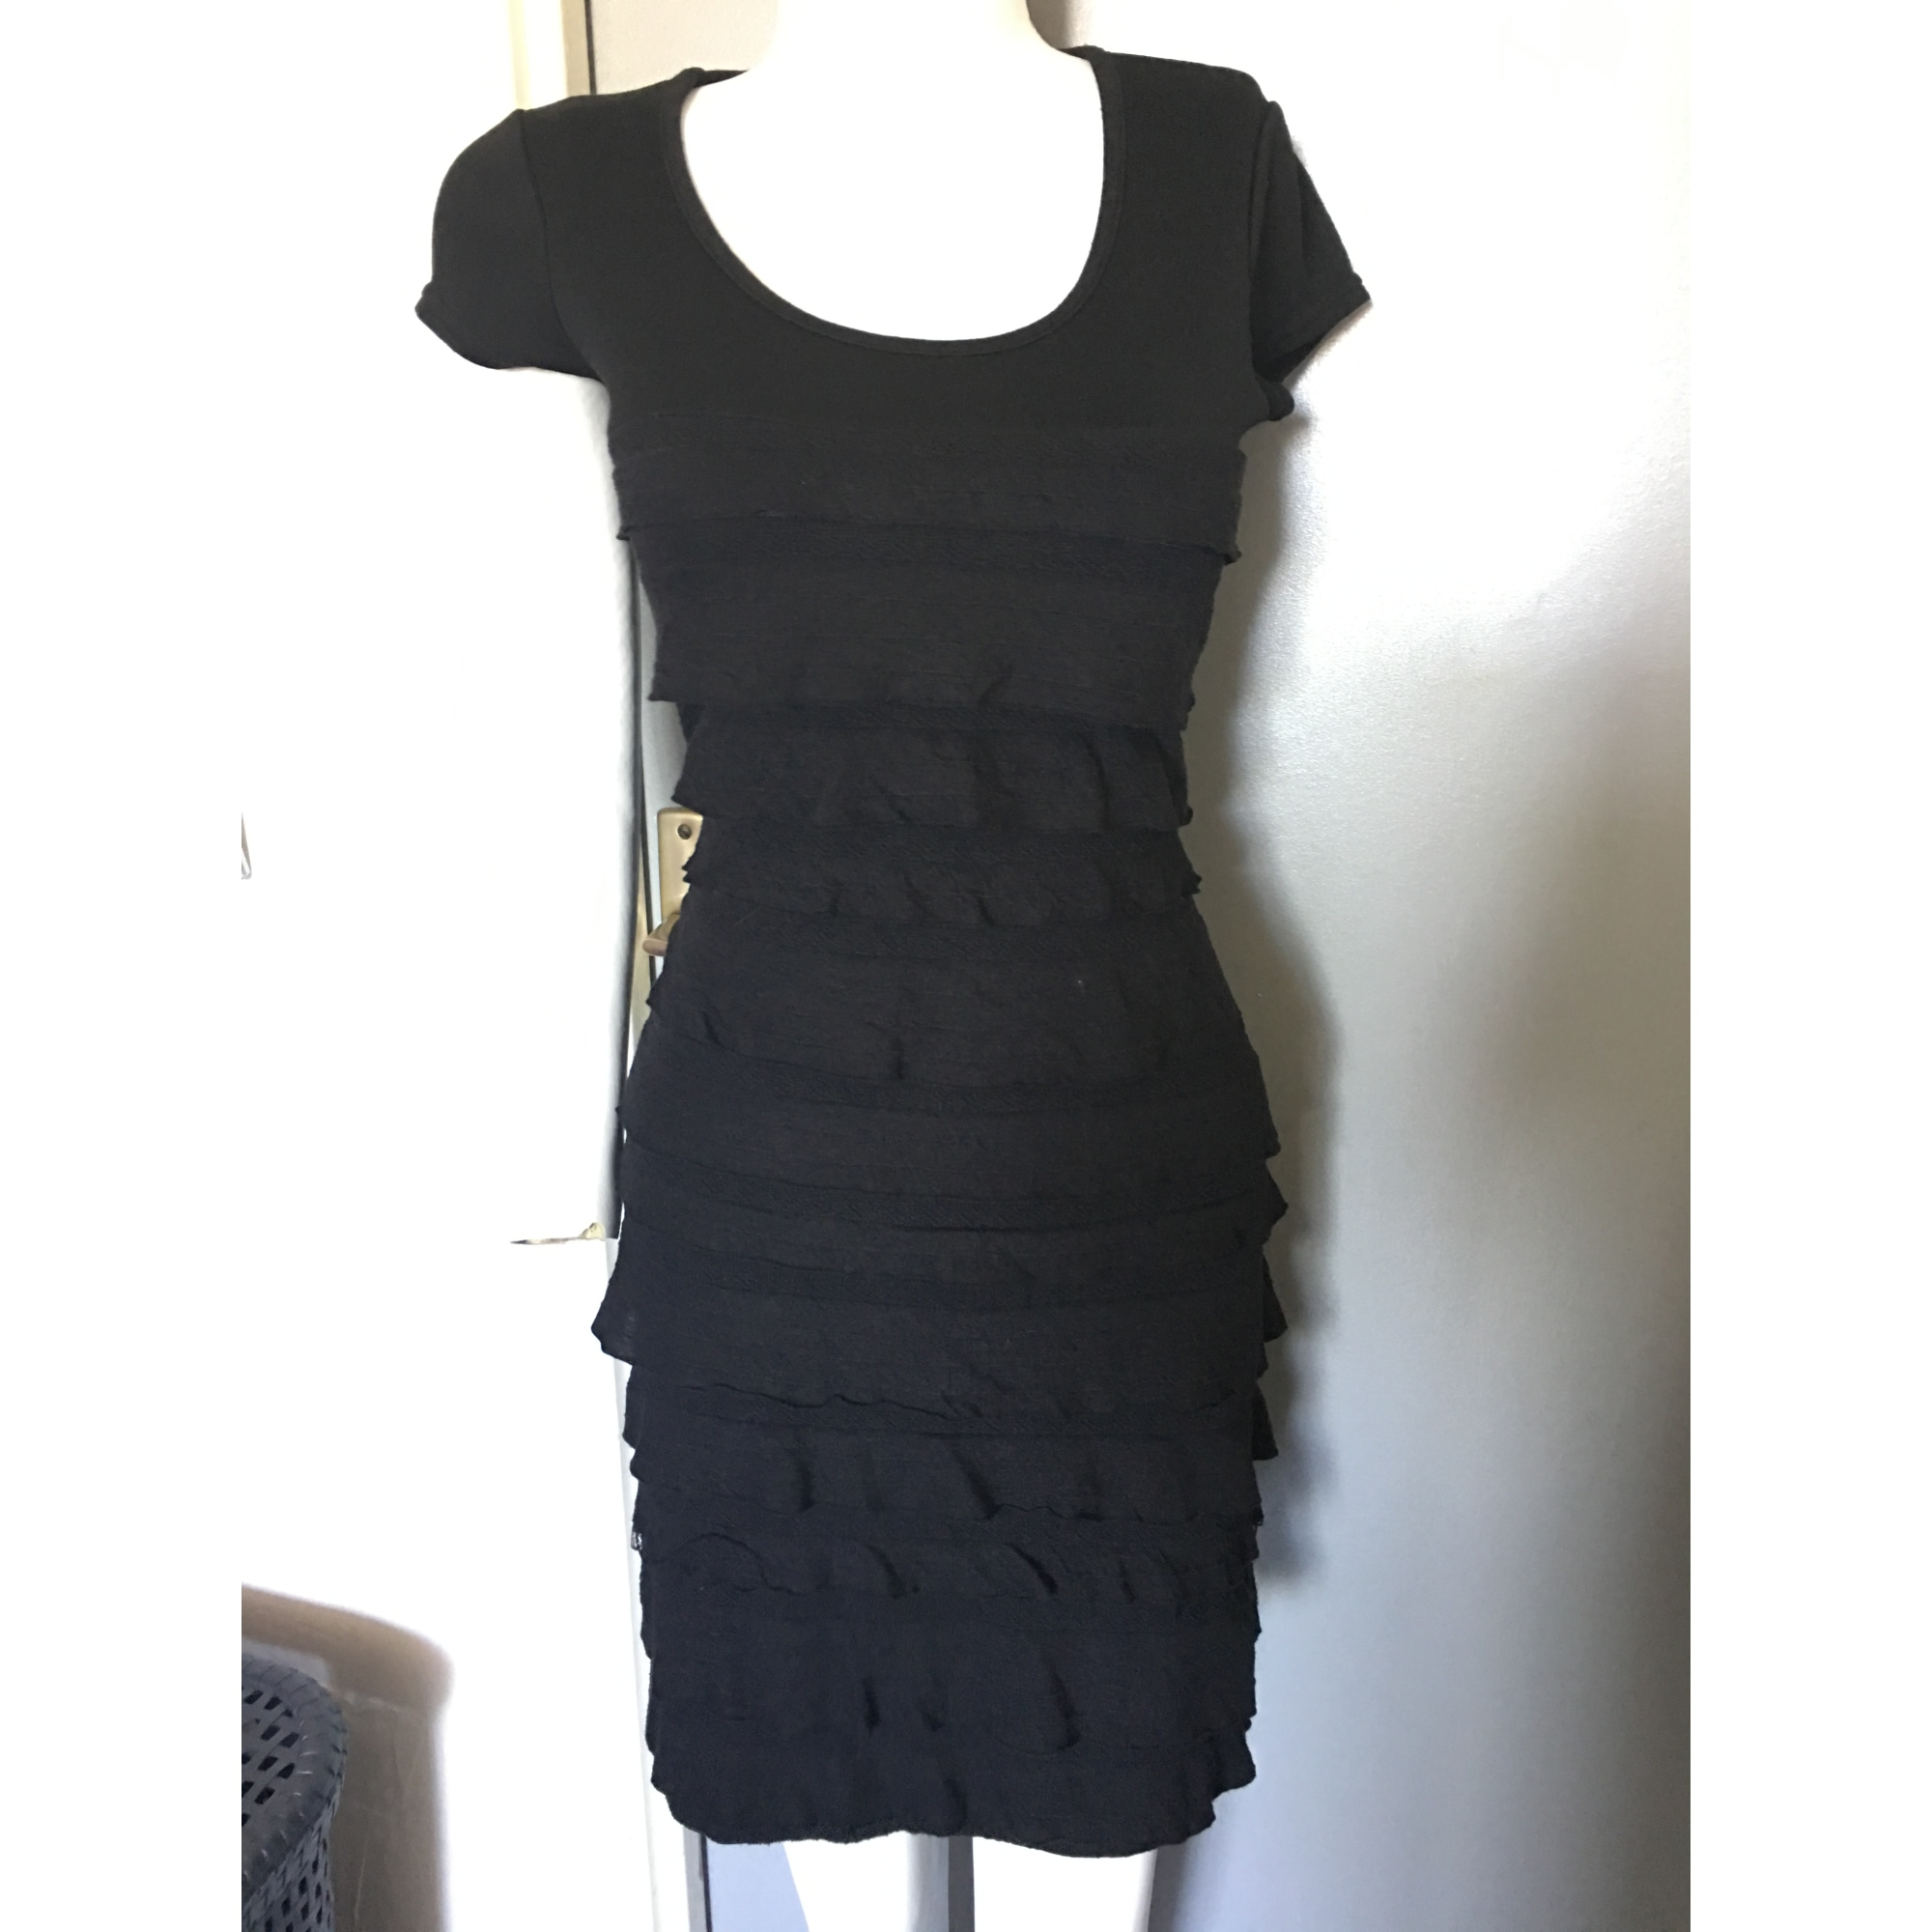 Renatto Unique Bene Courte Noir Robe 6258725 Taille aW54SSxq